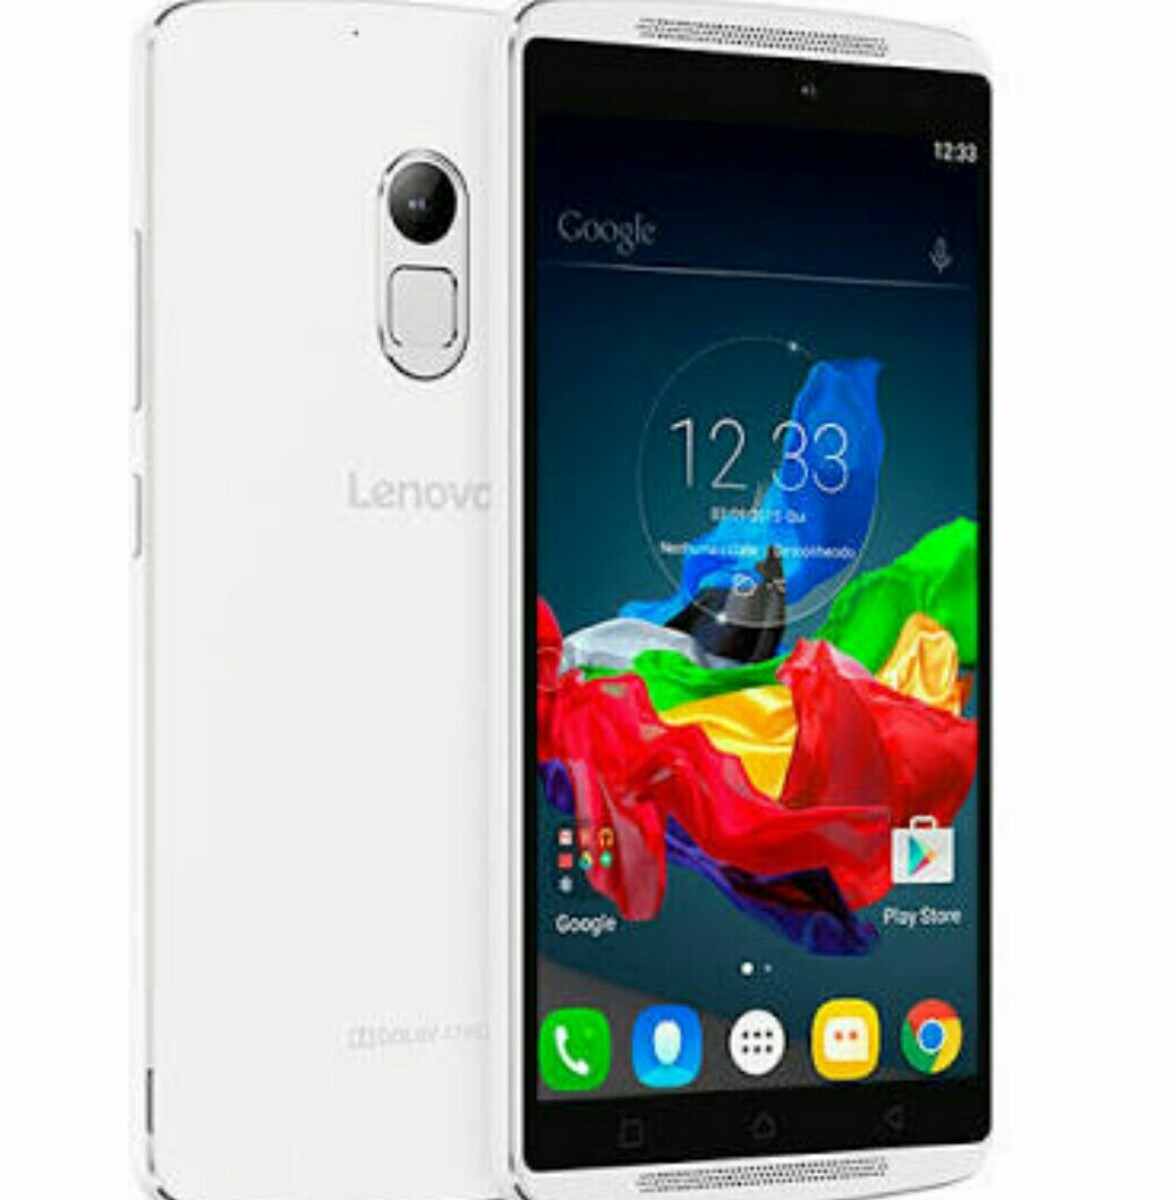 72993eacba1 Smartphone Lenovo Vibe A7010 Branco Semi Novo - R$ 650,00 em Mercado ...